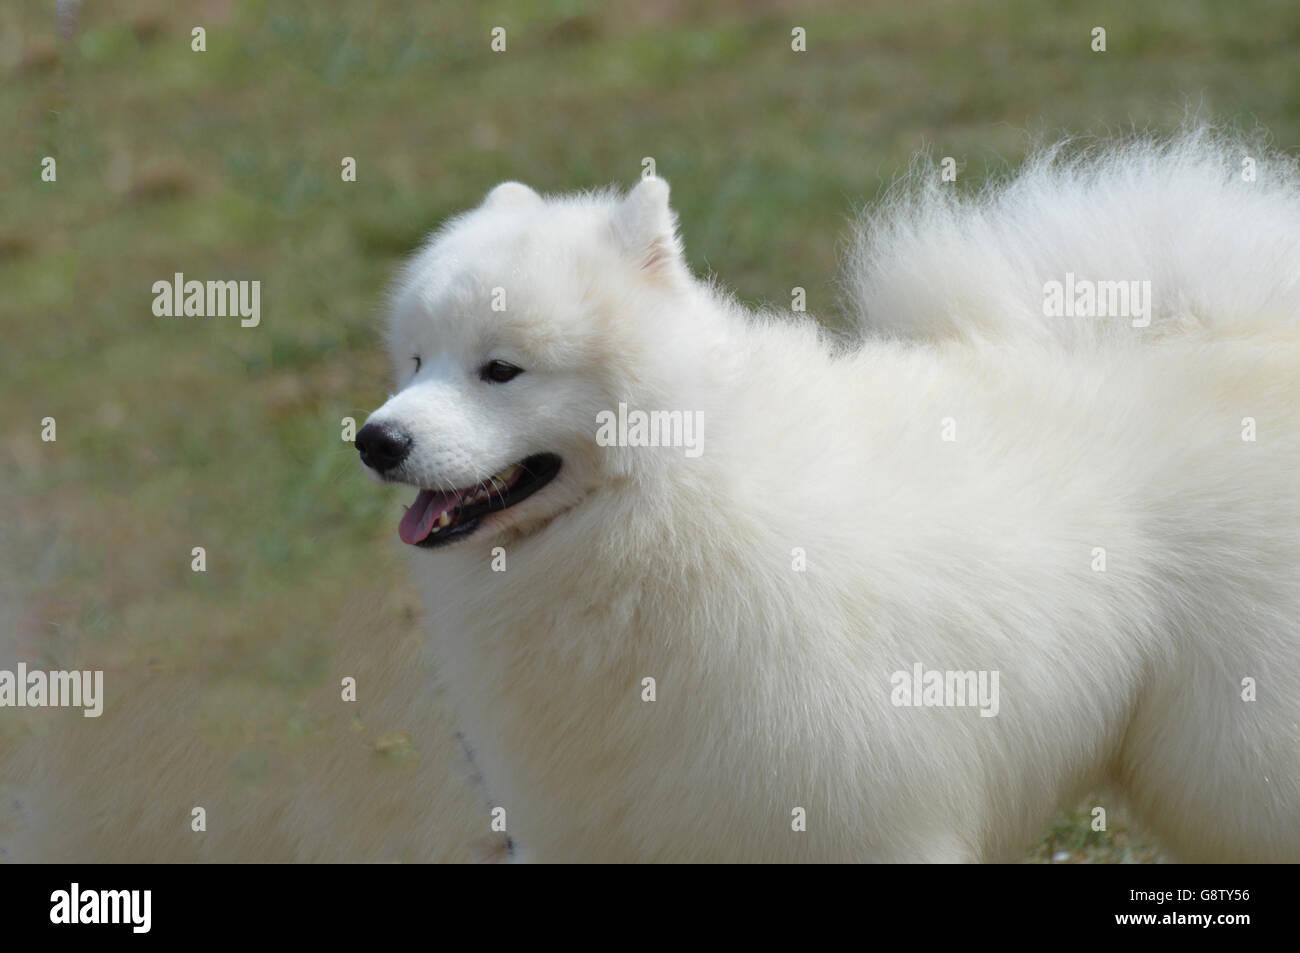 Superbe fluffy white American Eskimo Dog avec un visage mignon. Banque D'Images